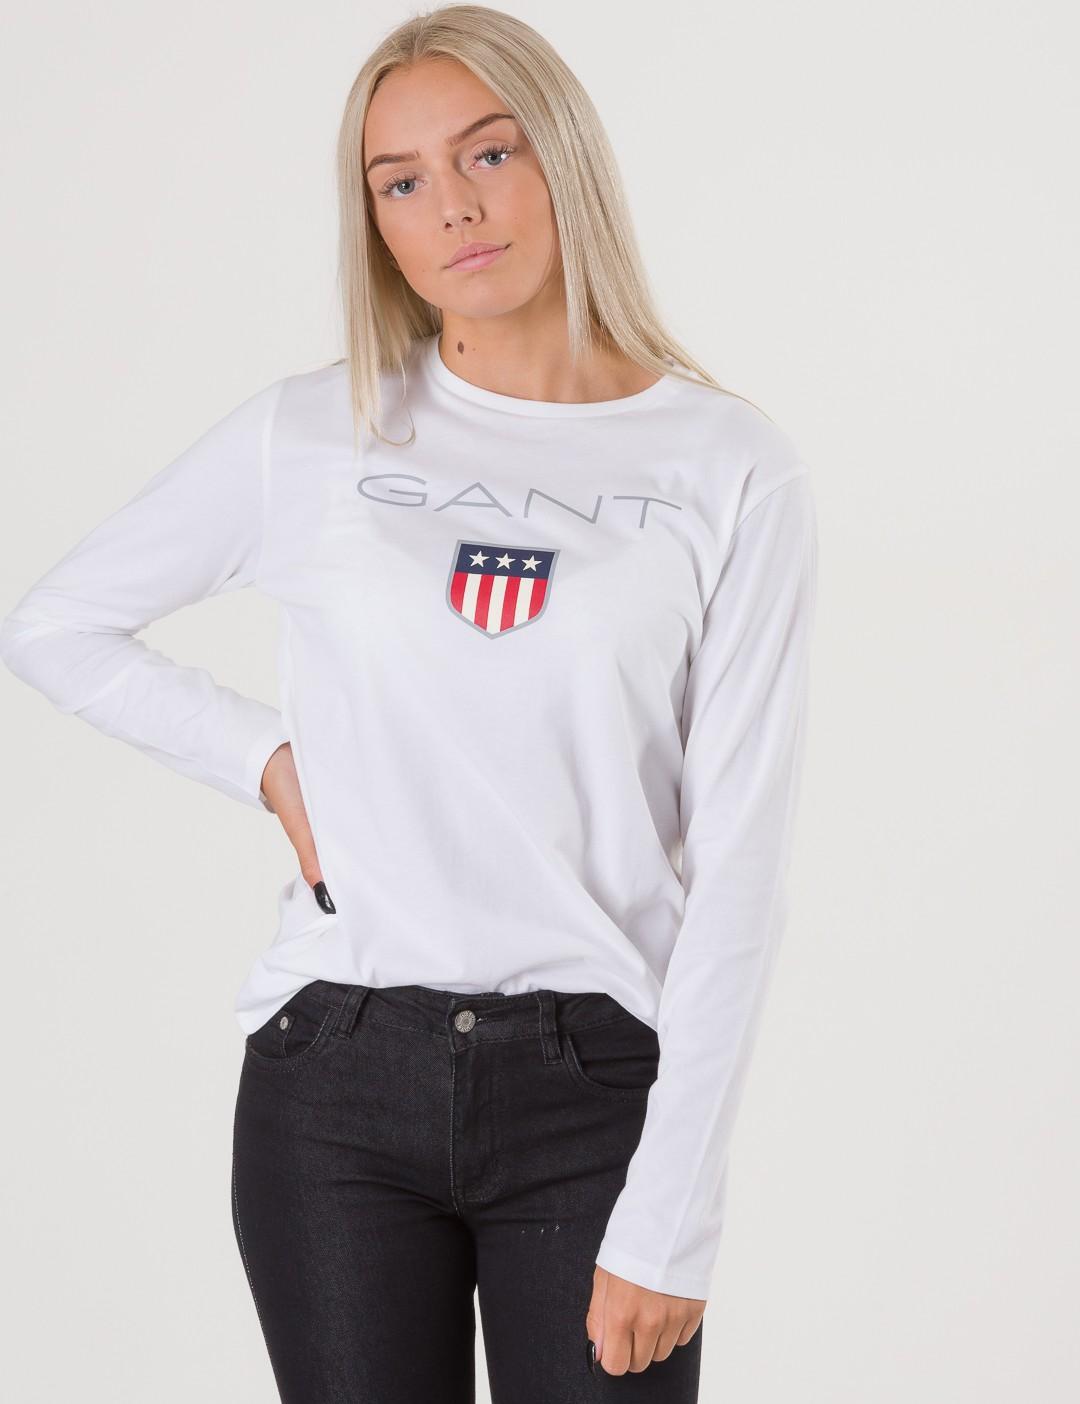 Om Tb. Gant Shield Logo Ls T-Shirt - Vit från Gant  fc4a801f160ac